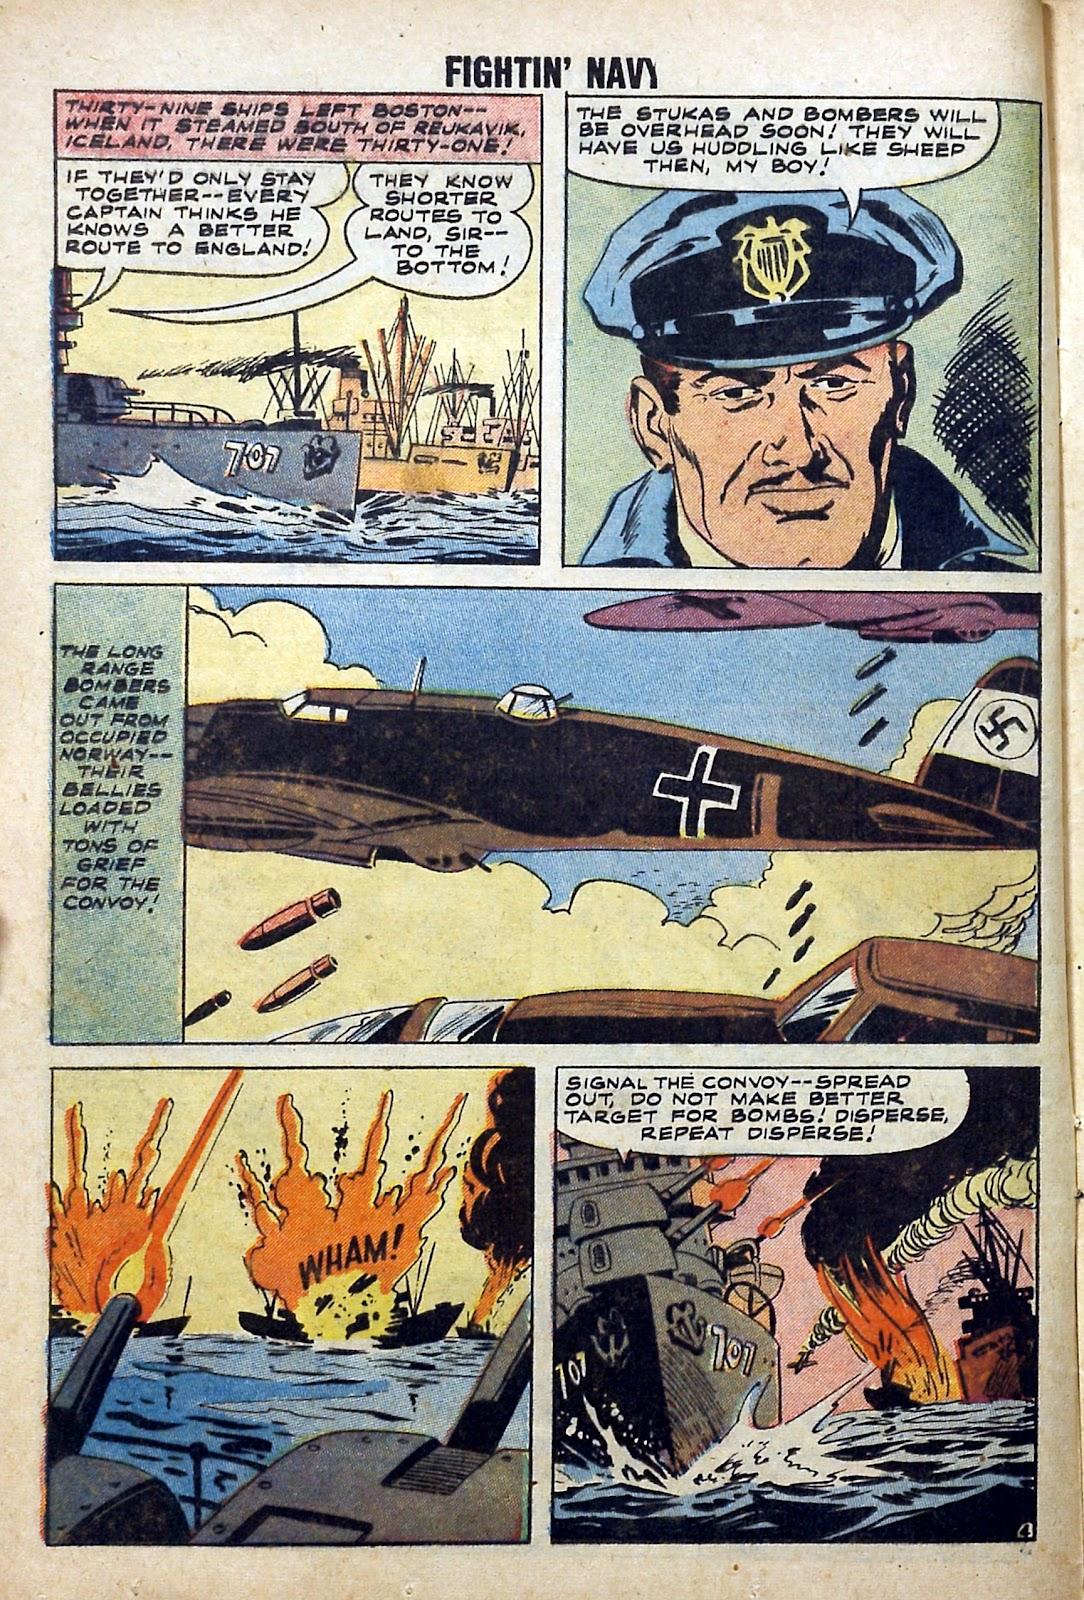 Read online Fightin' Navy comic -  Issue #84 - 12